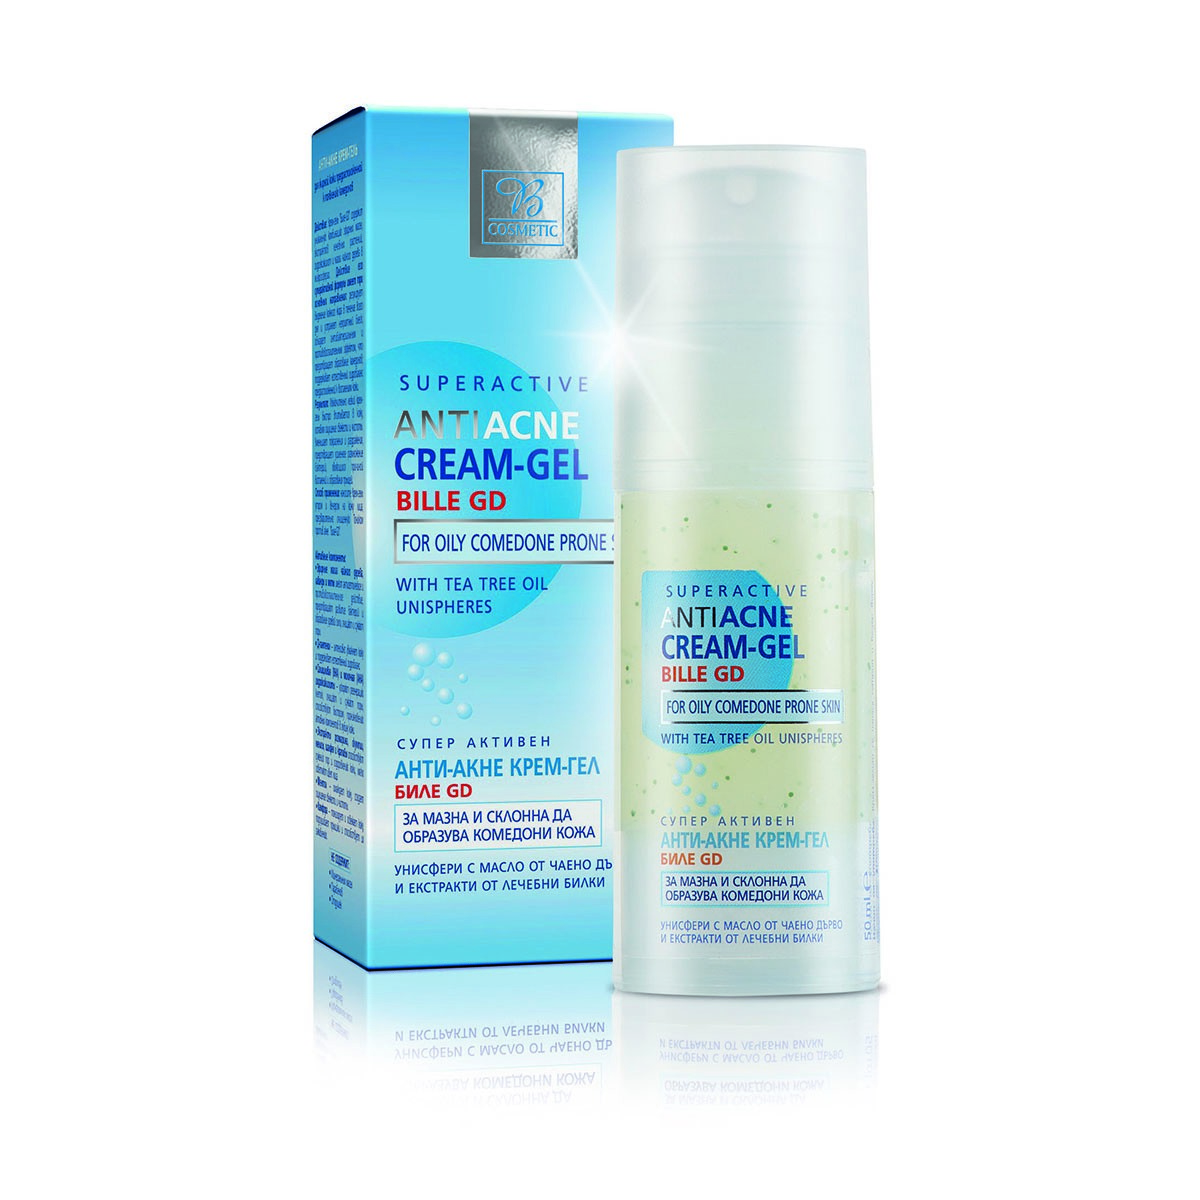 Anti acne cream-gel for oily and problematic skin Bodi Beauty